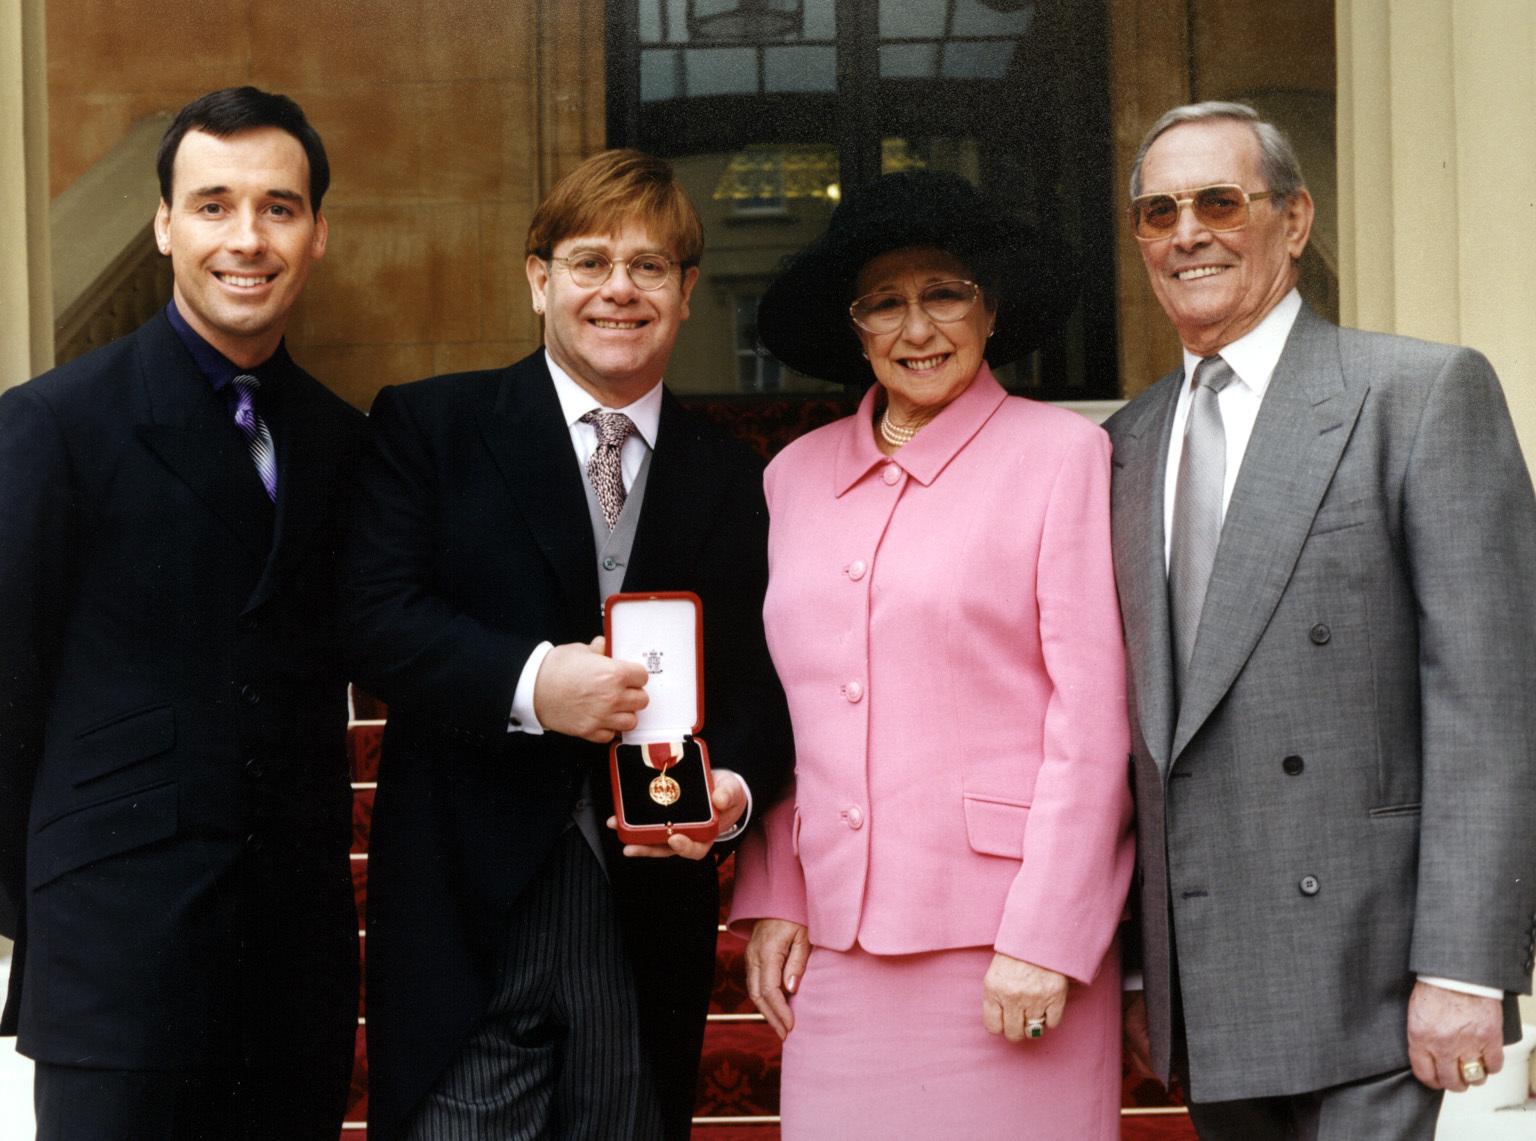 Elton John, David Furnish, Mother Sheila, Stepfath